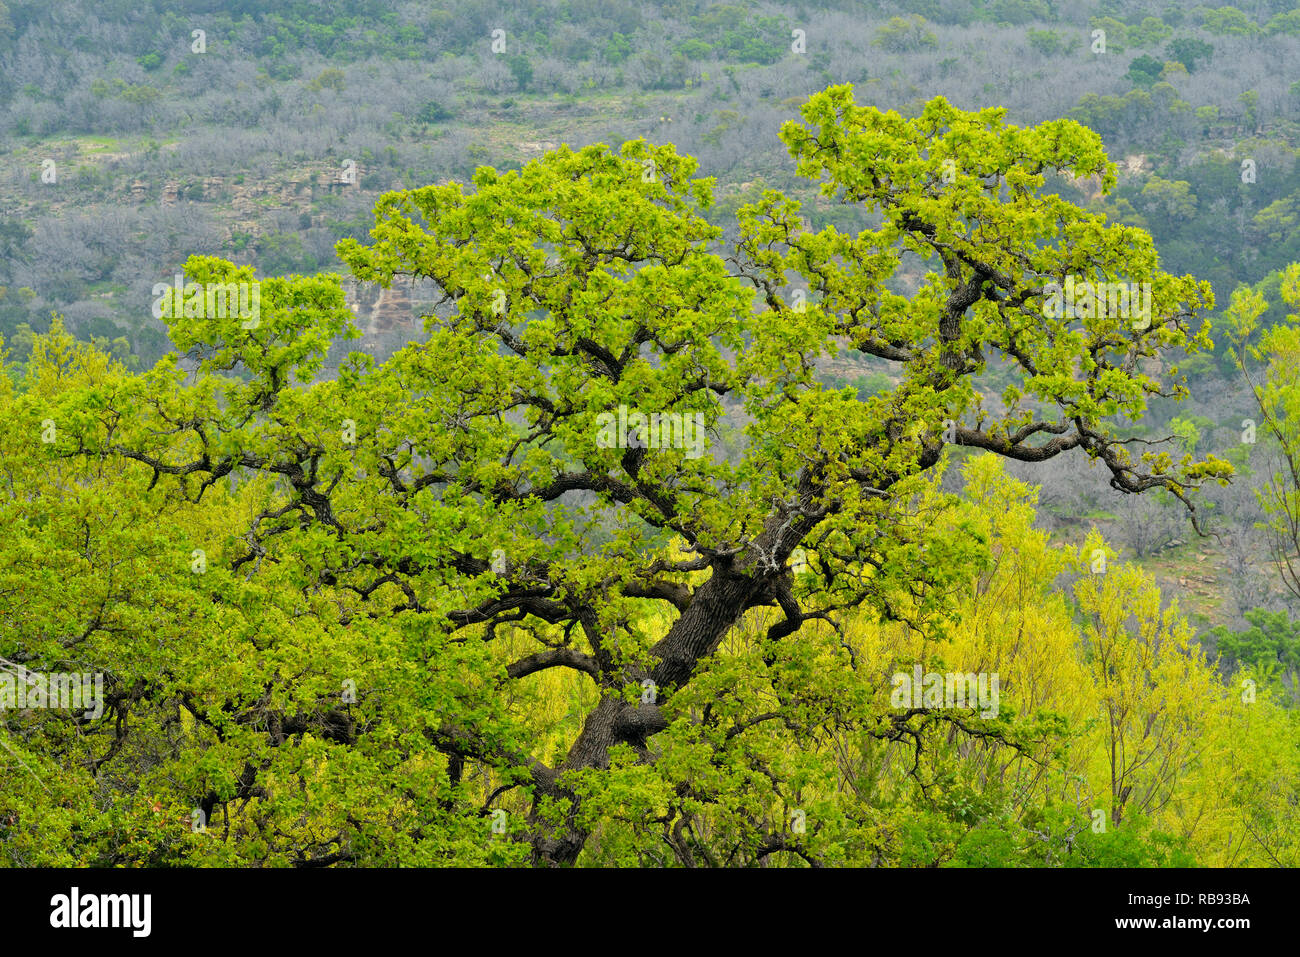 Spring oak trees, Willow City, Gillespie County, Texas, USA - Stock Image